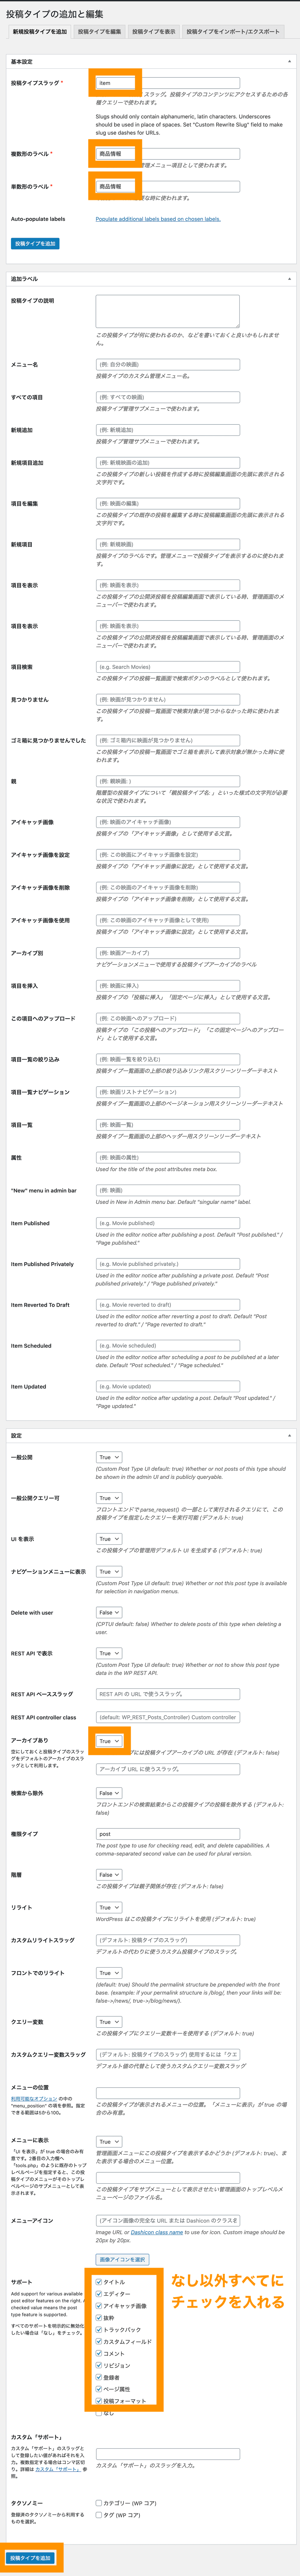 Custom Post Type UI 投稿の追加画面